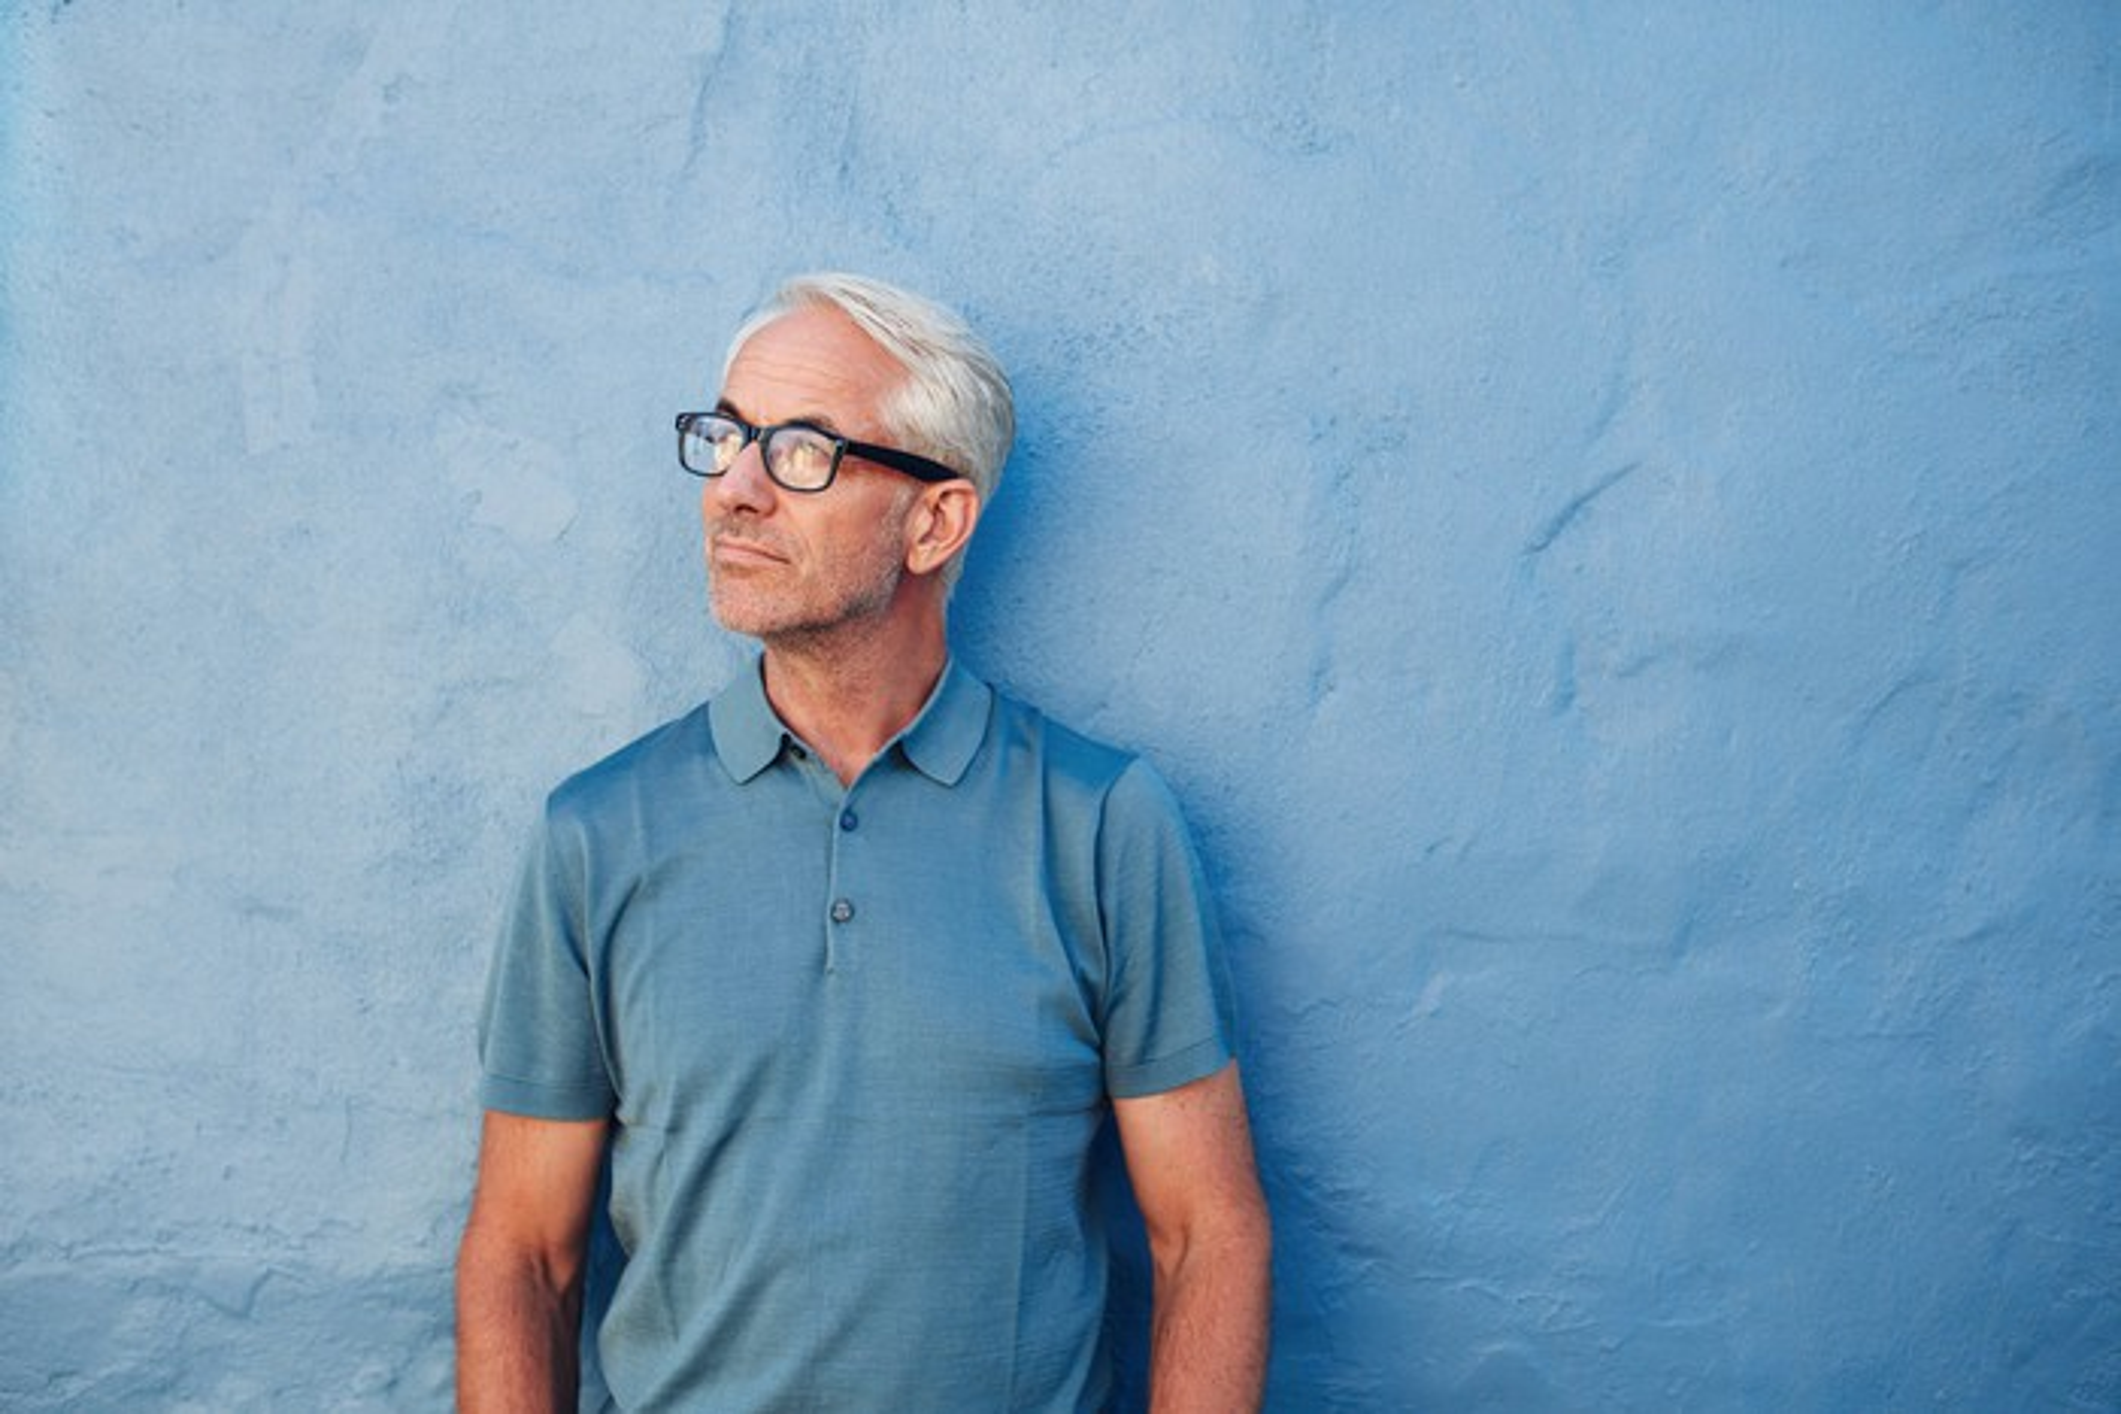 Older man wearing eyeglasses standing against a blue background